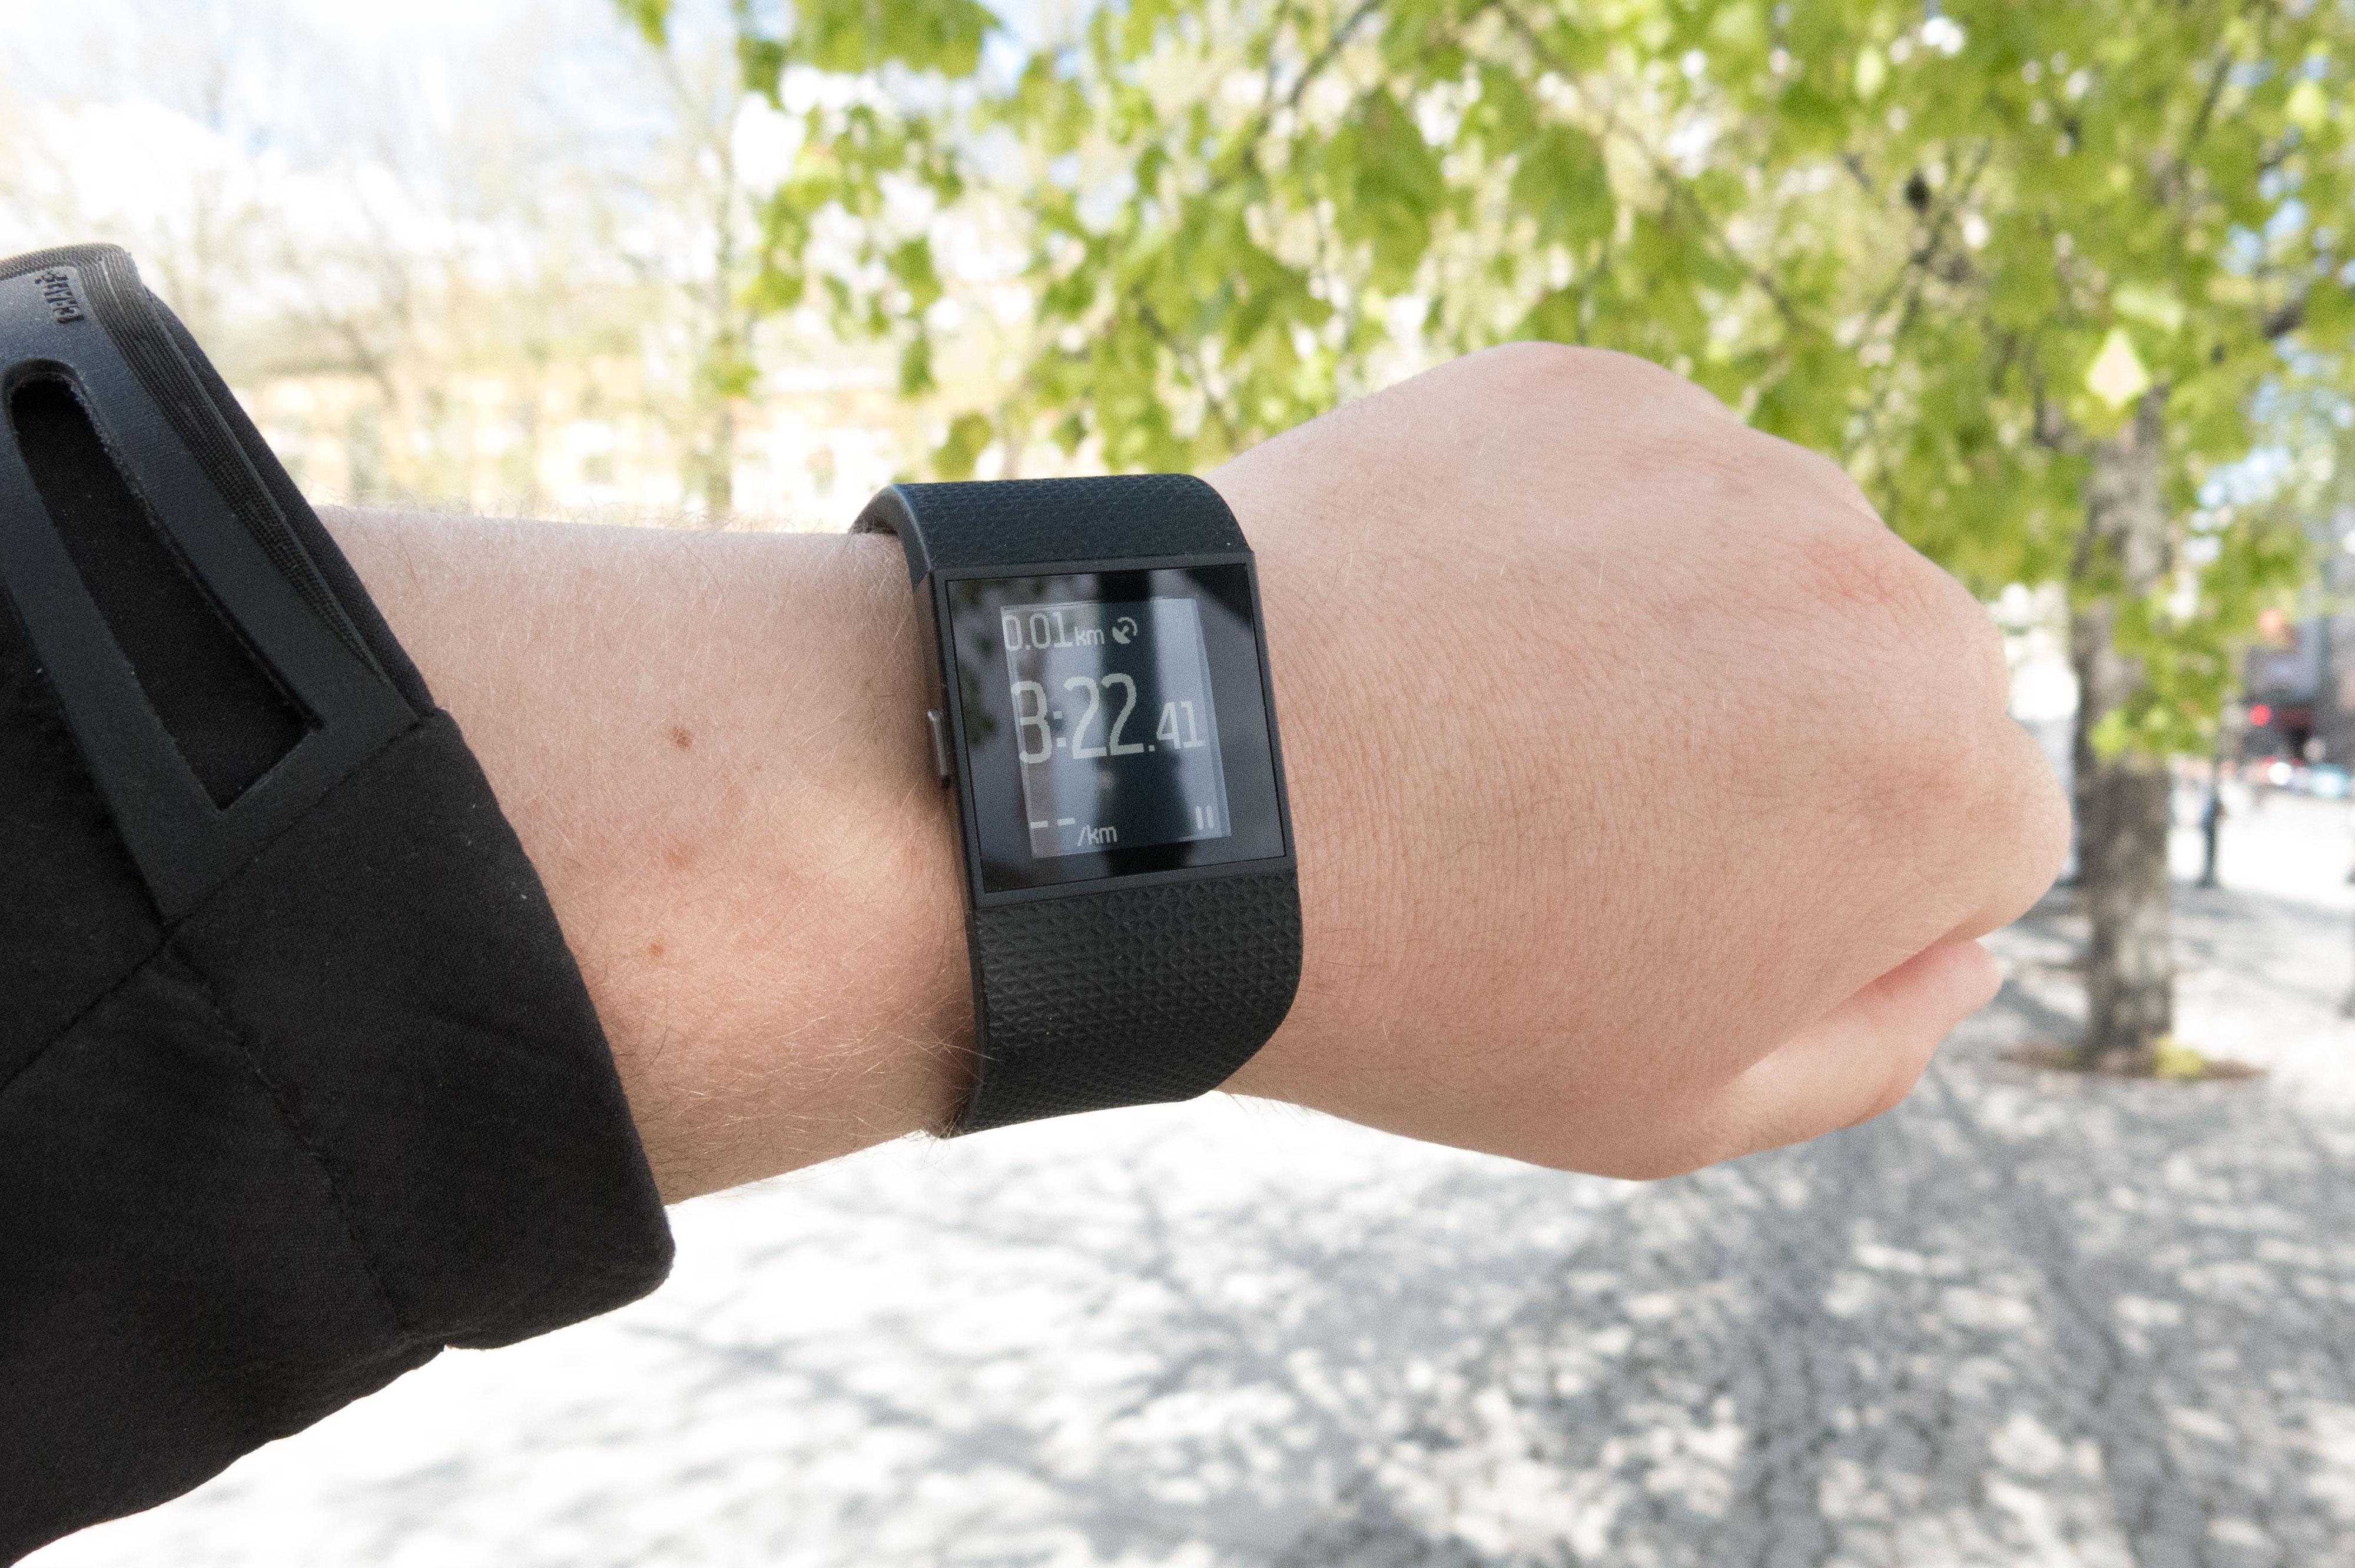 Surge er Fitbits største aktivitetsmåler. Foto: Ole Henrik Johansen / Tek.no